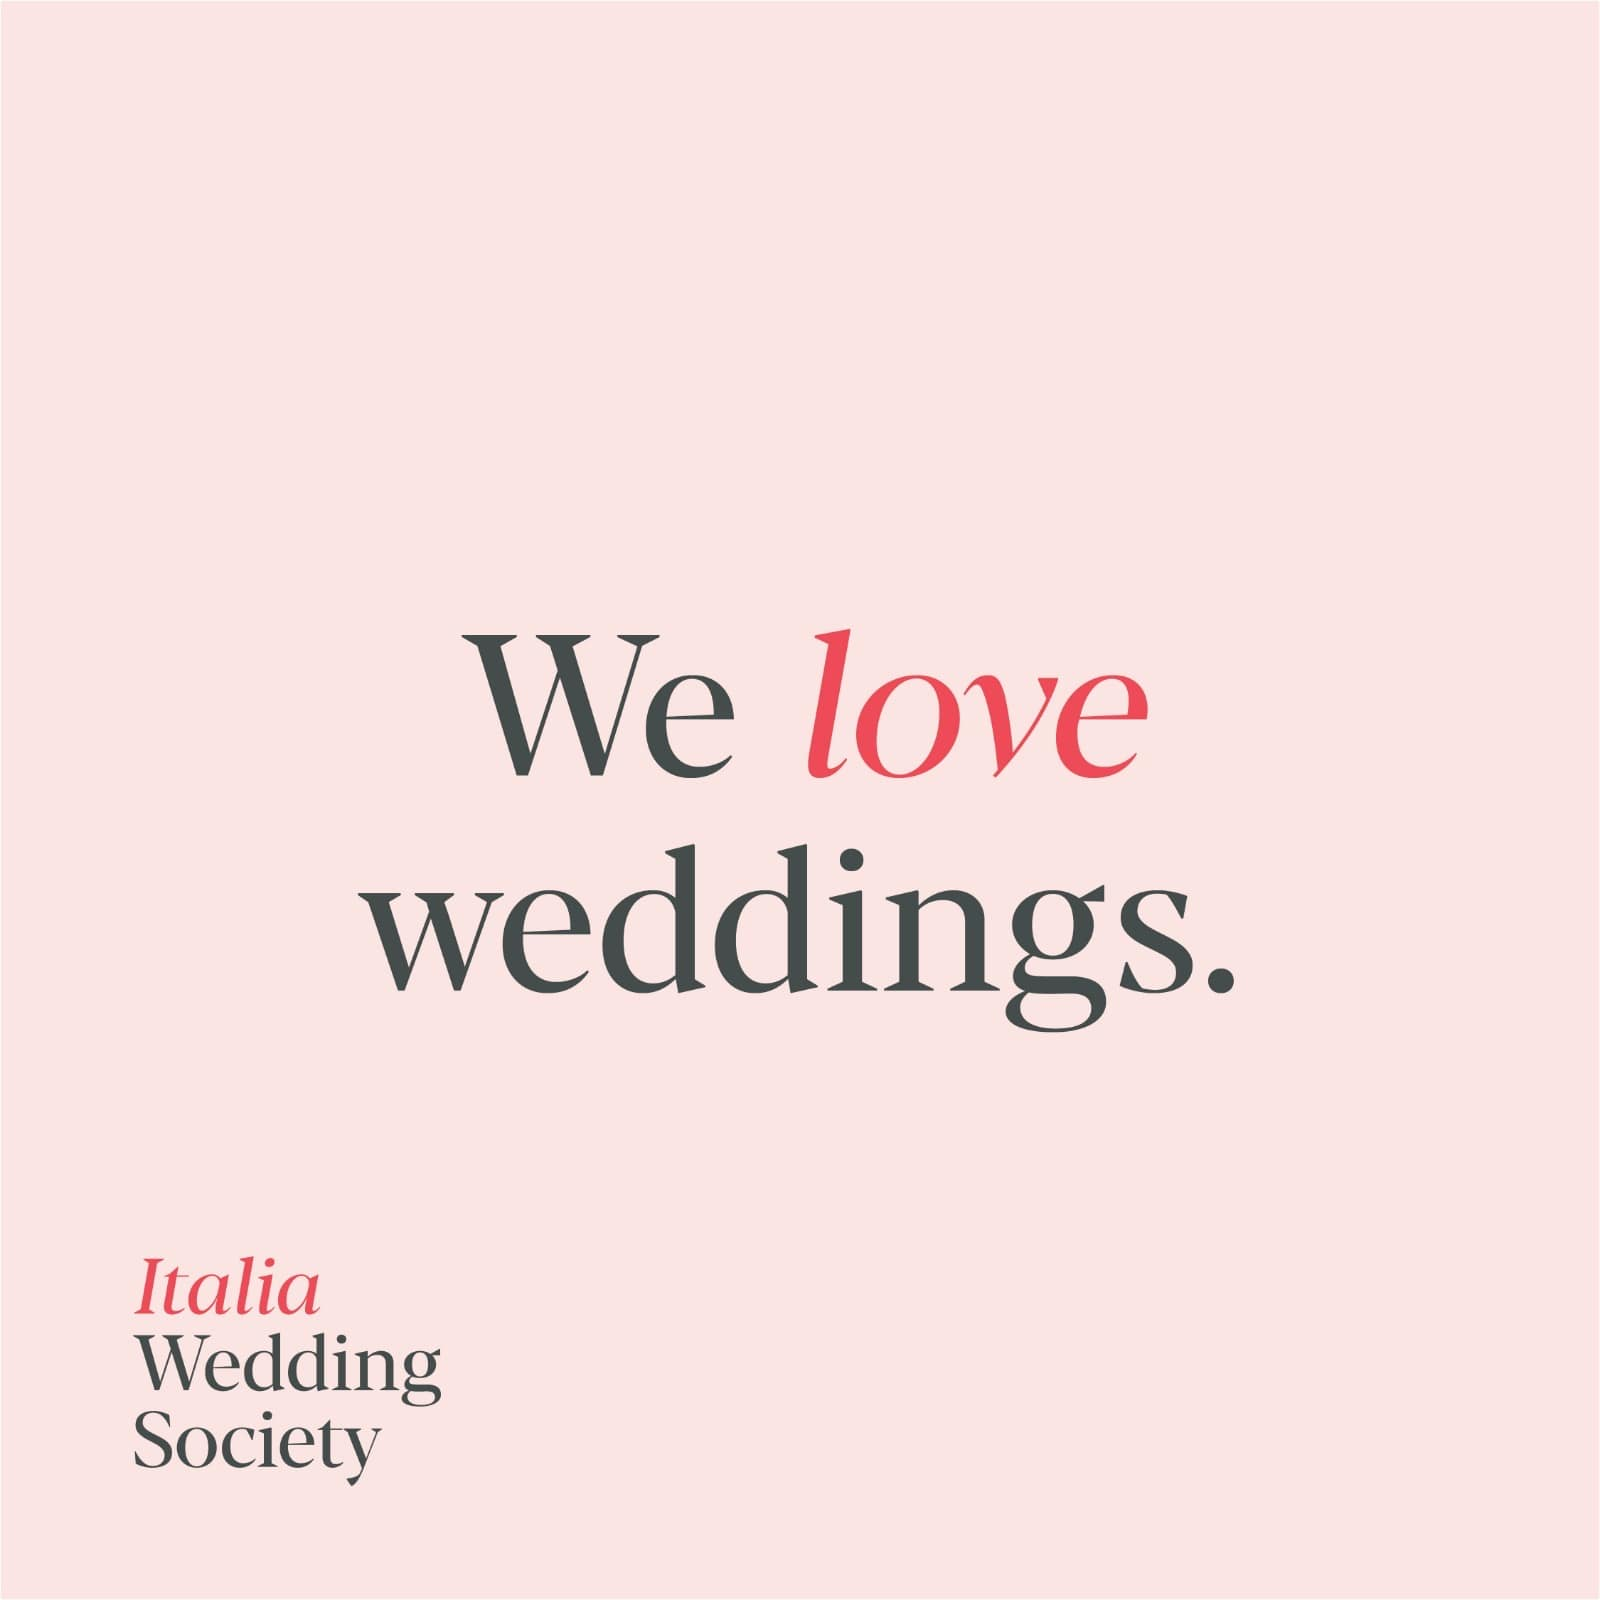 italia wedding society